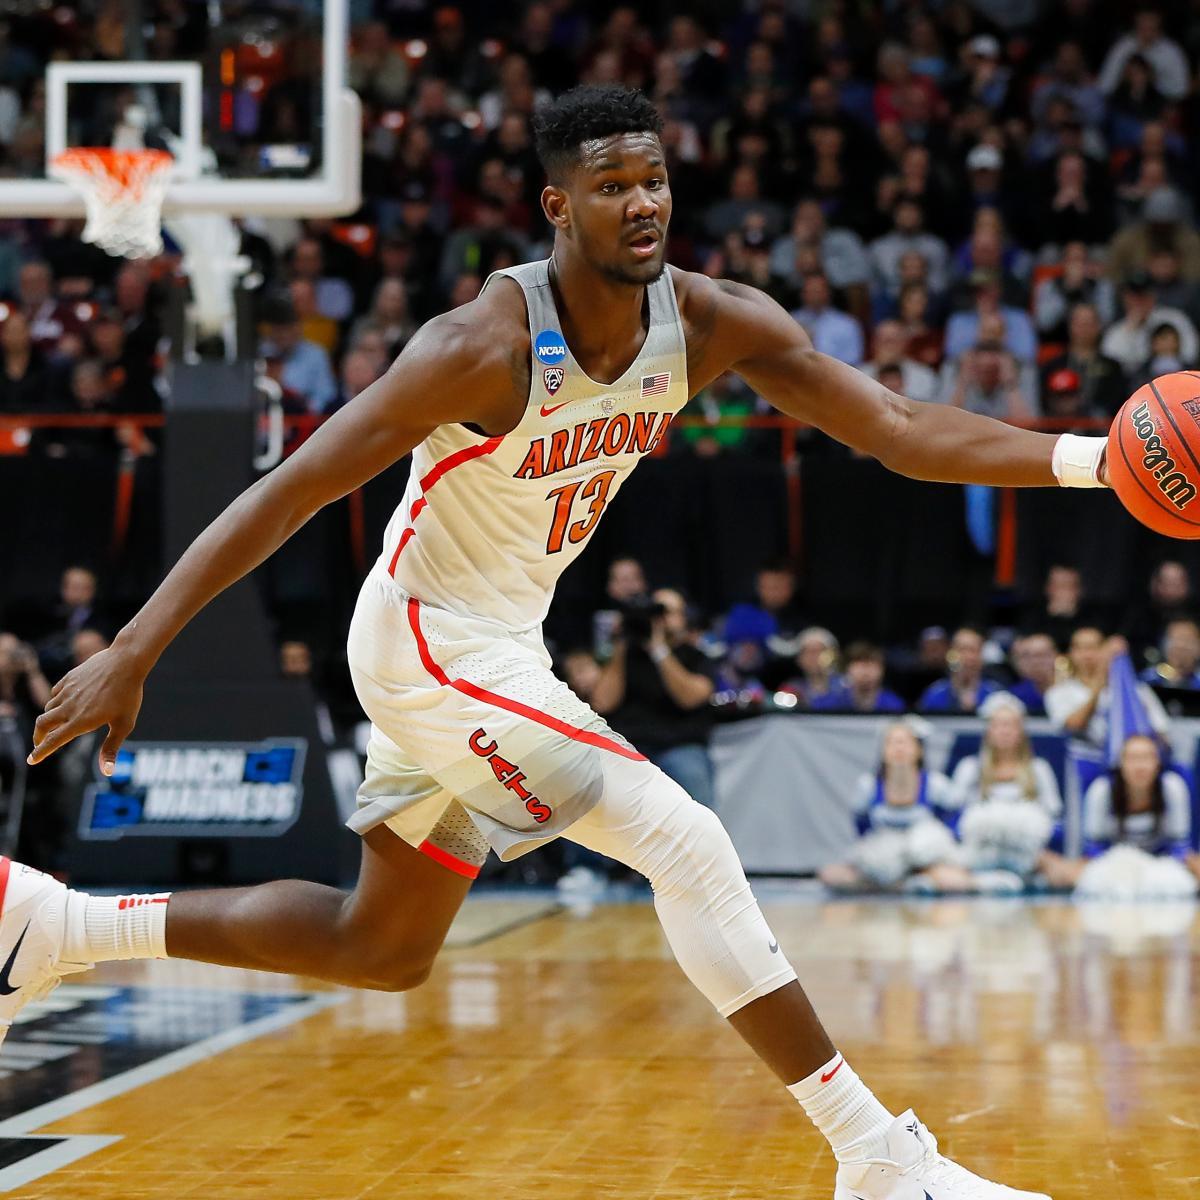 NBA Draft Odds 2018: Deandre Ayton, Luka Doncic Betting Props Hit Sportsbooks